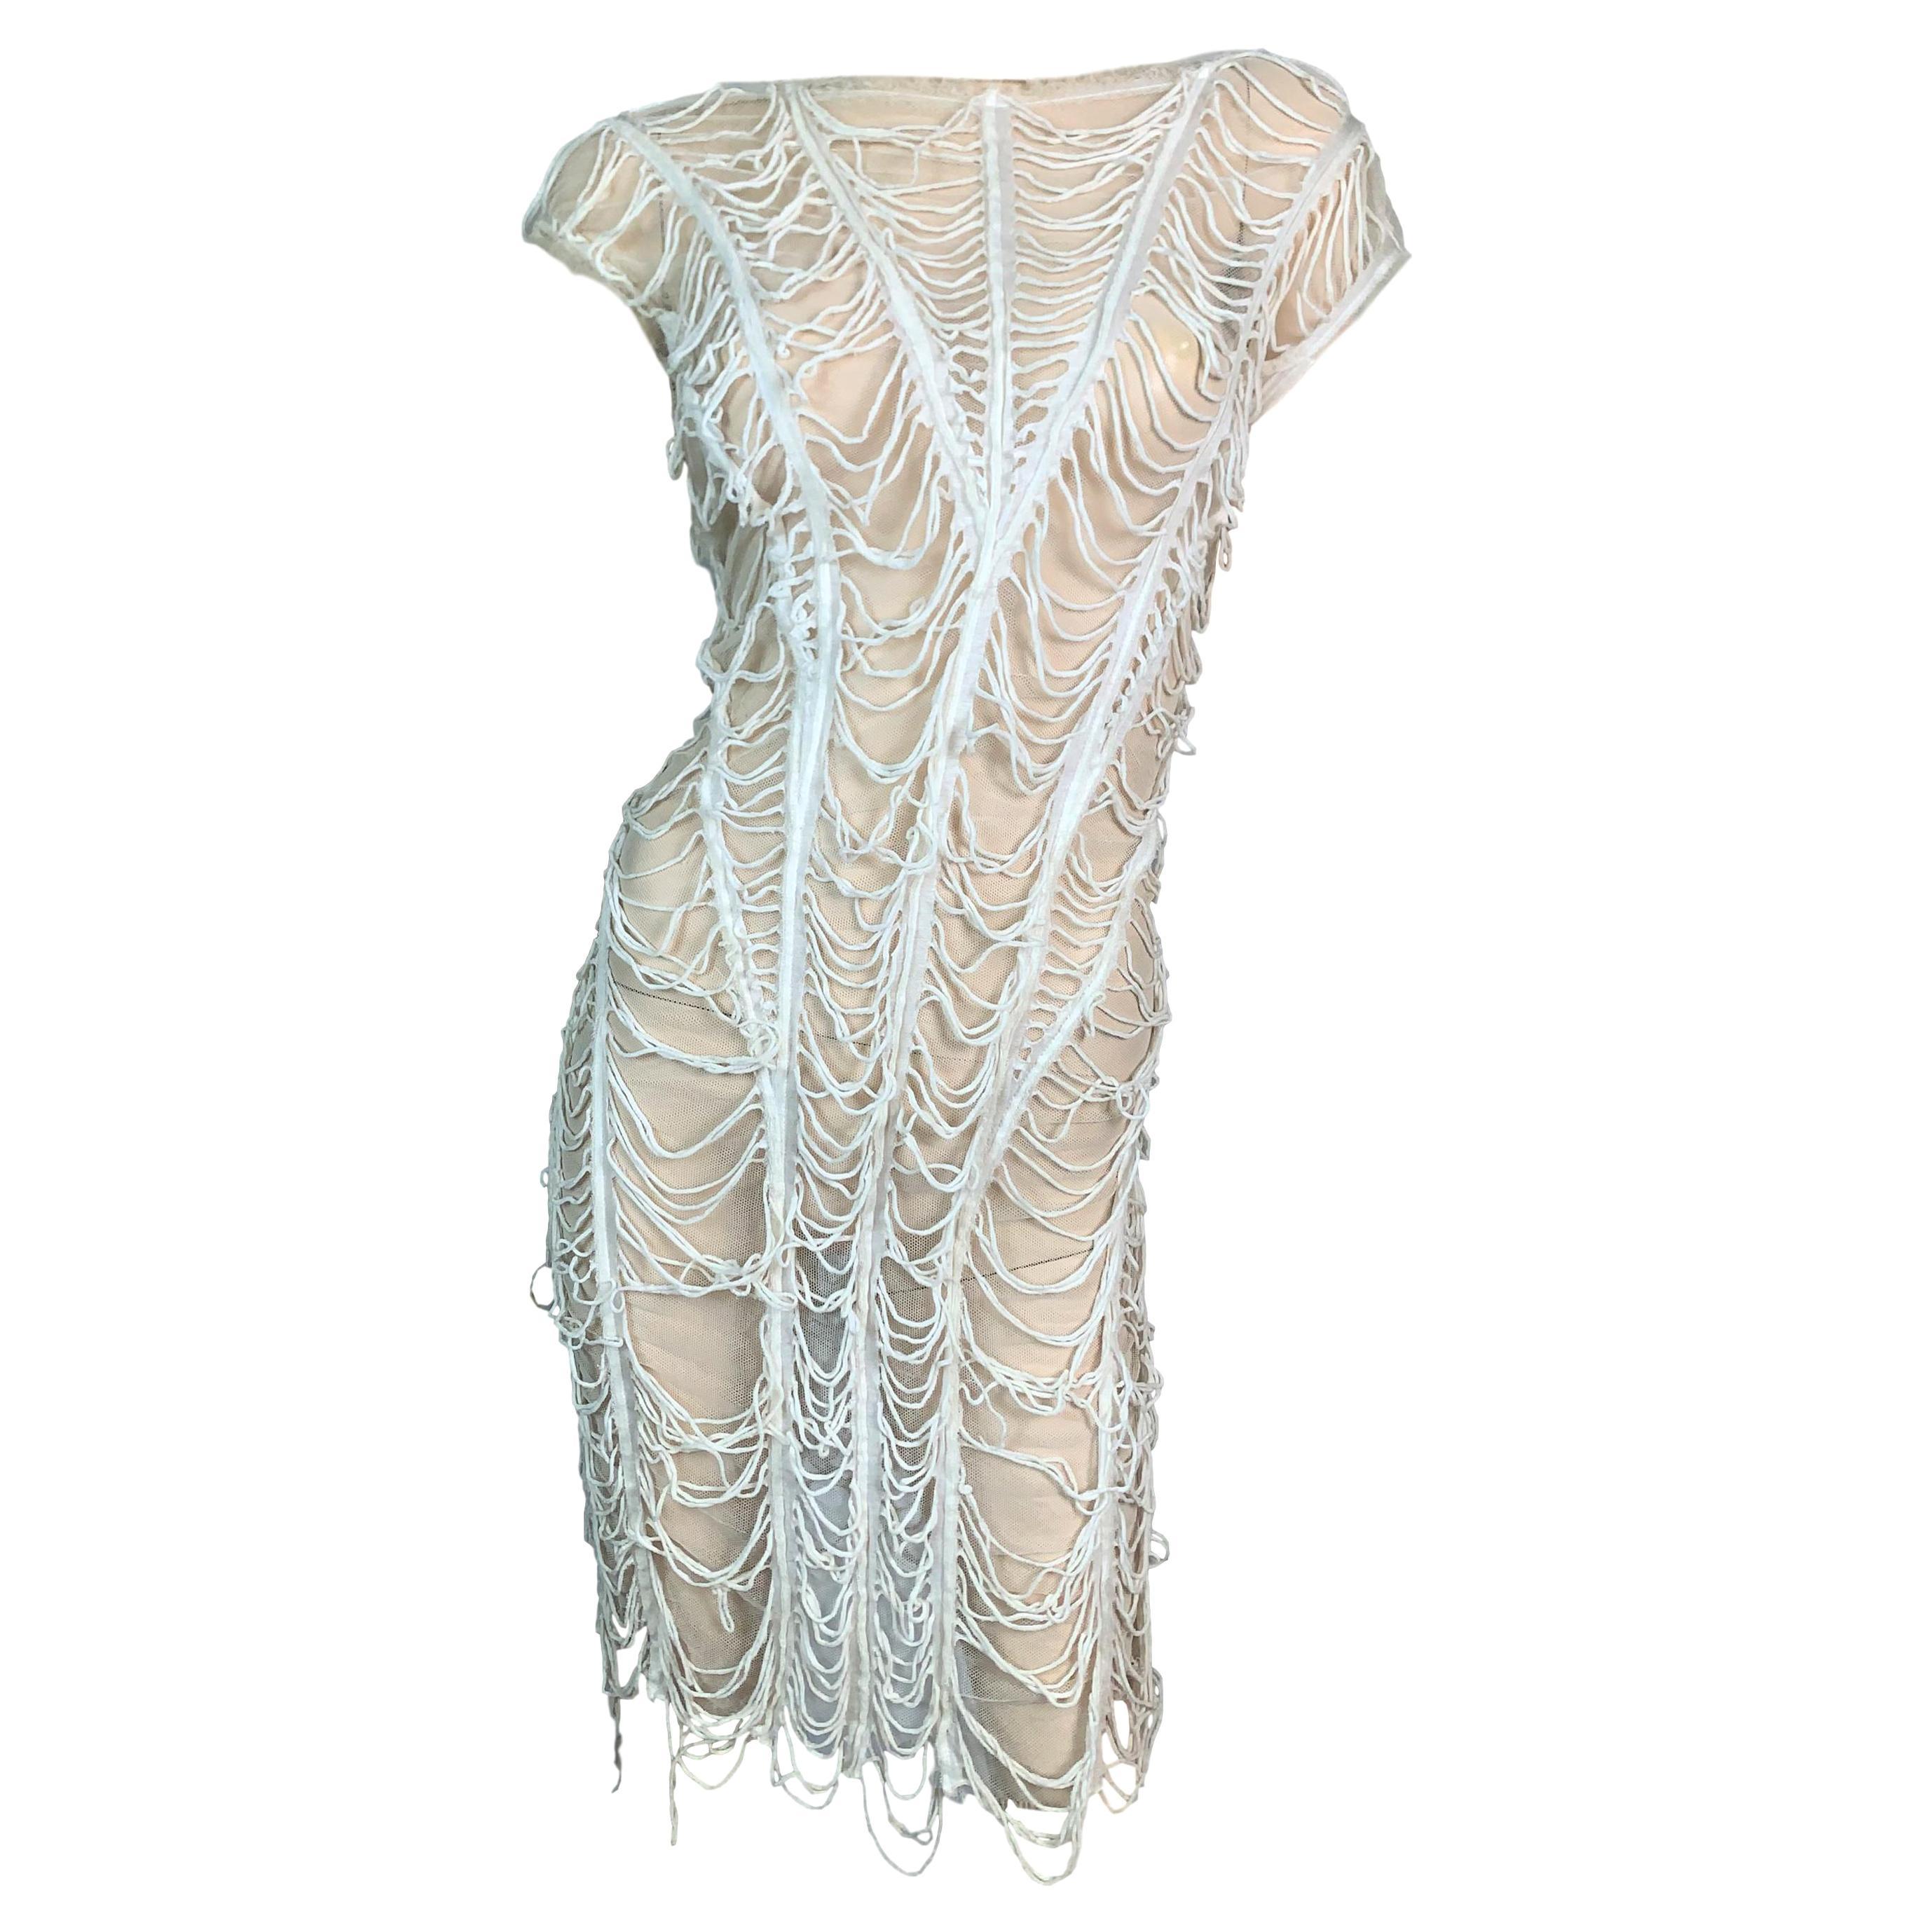 1990's Jean Paul Gaultier Sheer Ivory Mesh Spiderweb Dress